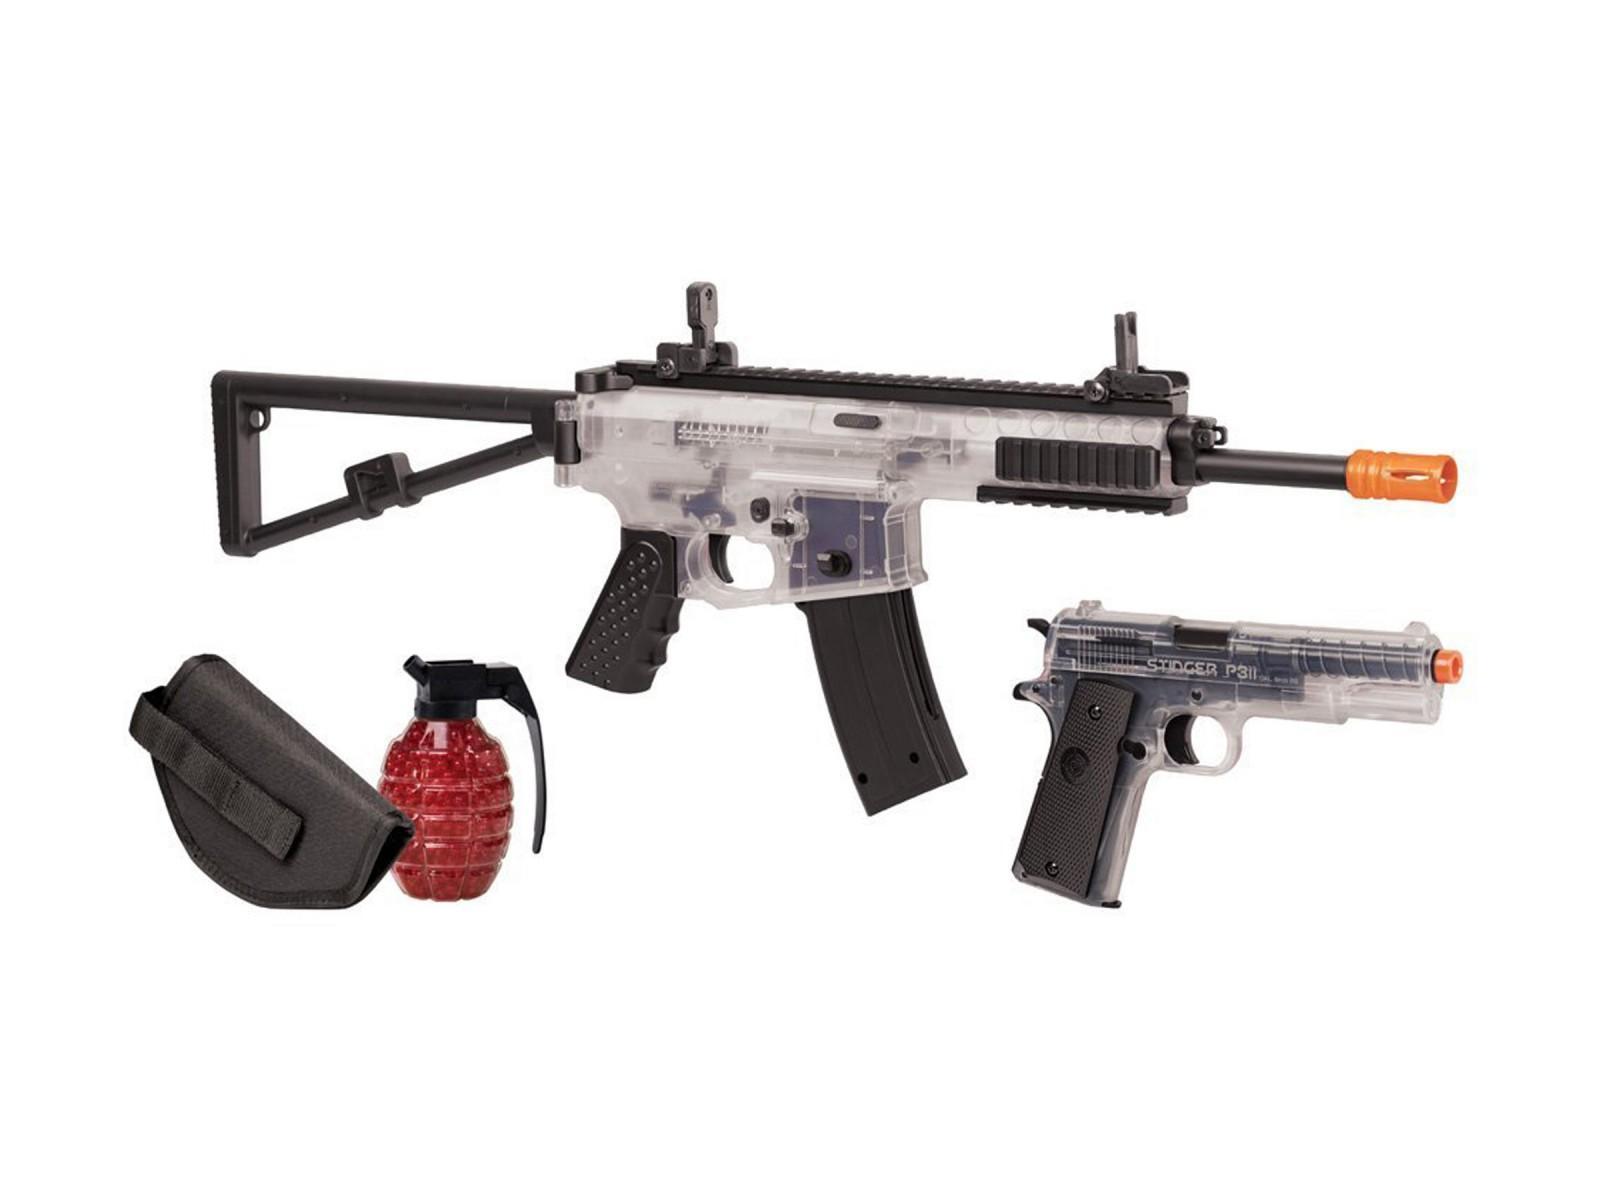 Crosman_AREKTC_Elite_Commando_Airsoft_Rifle_&_Pistol_Kit_6mm